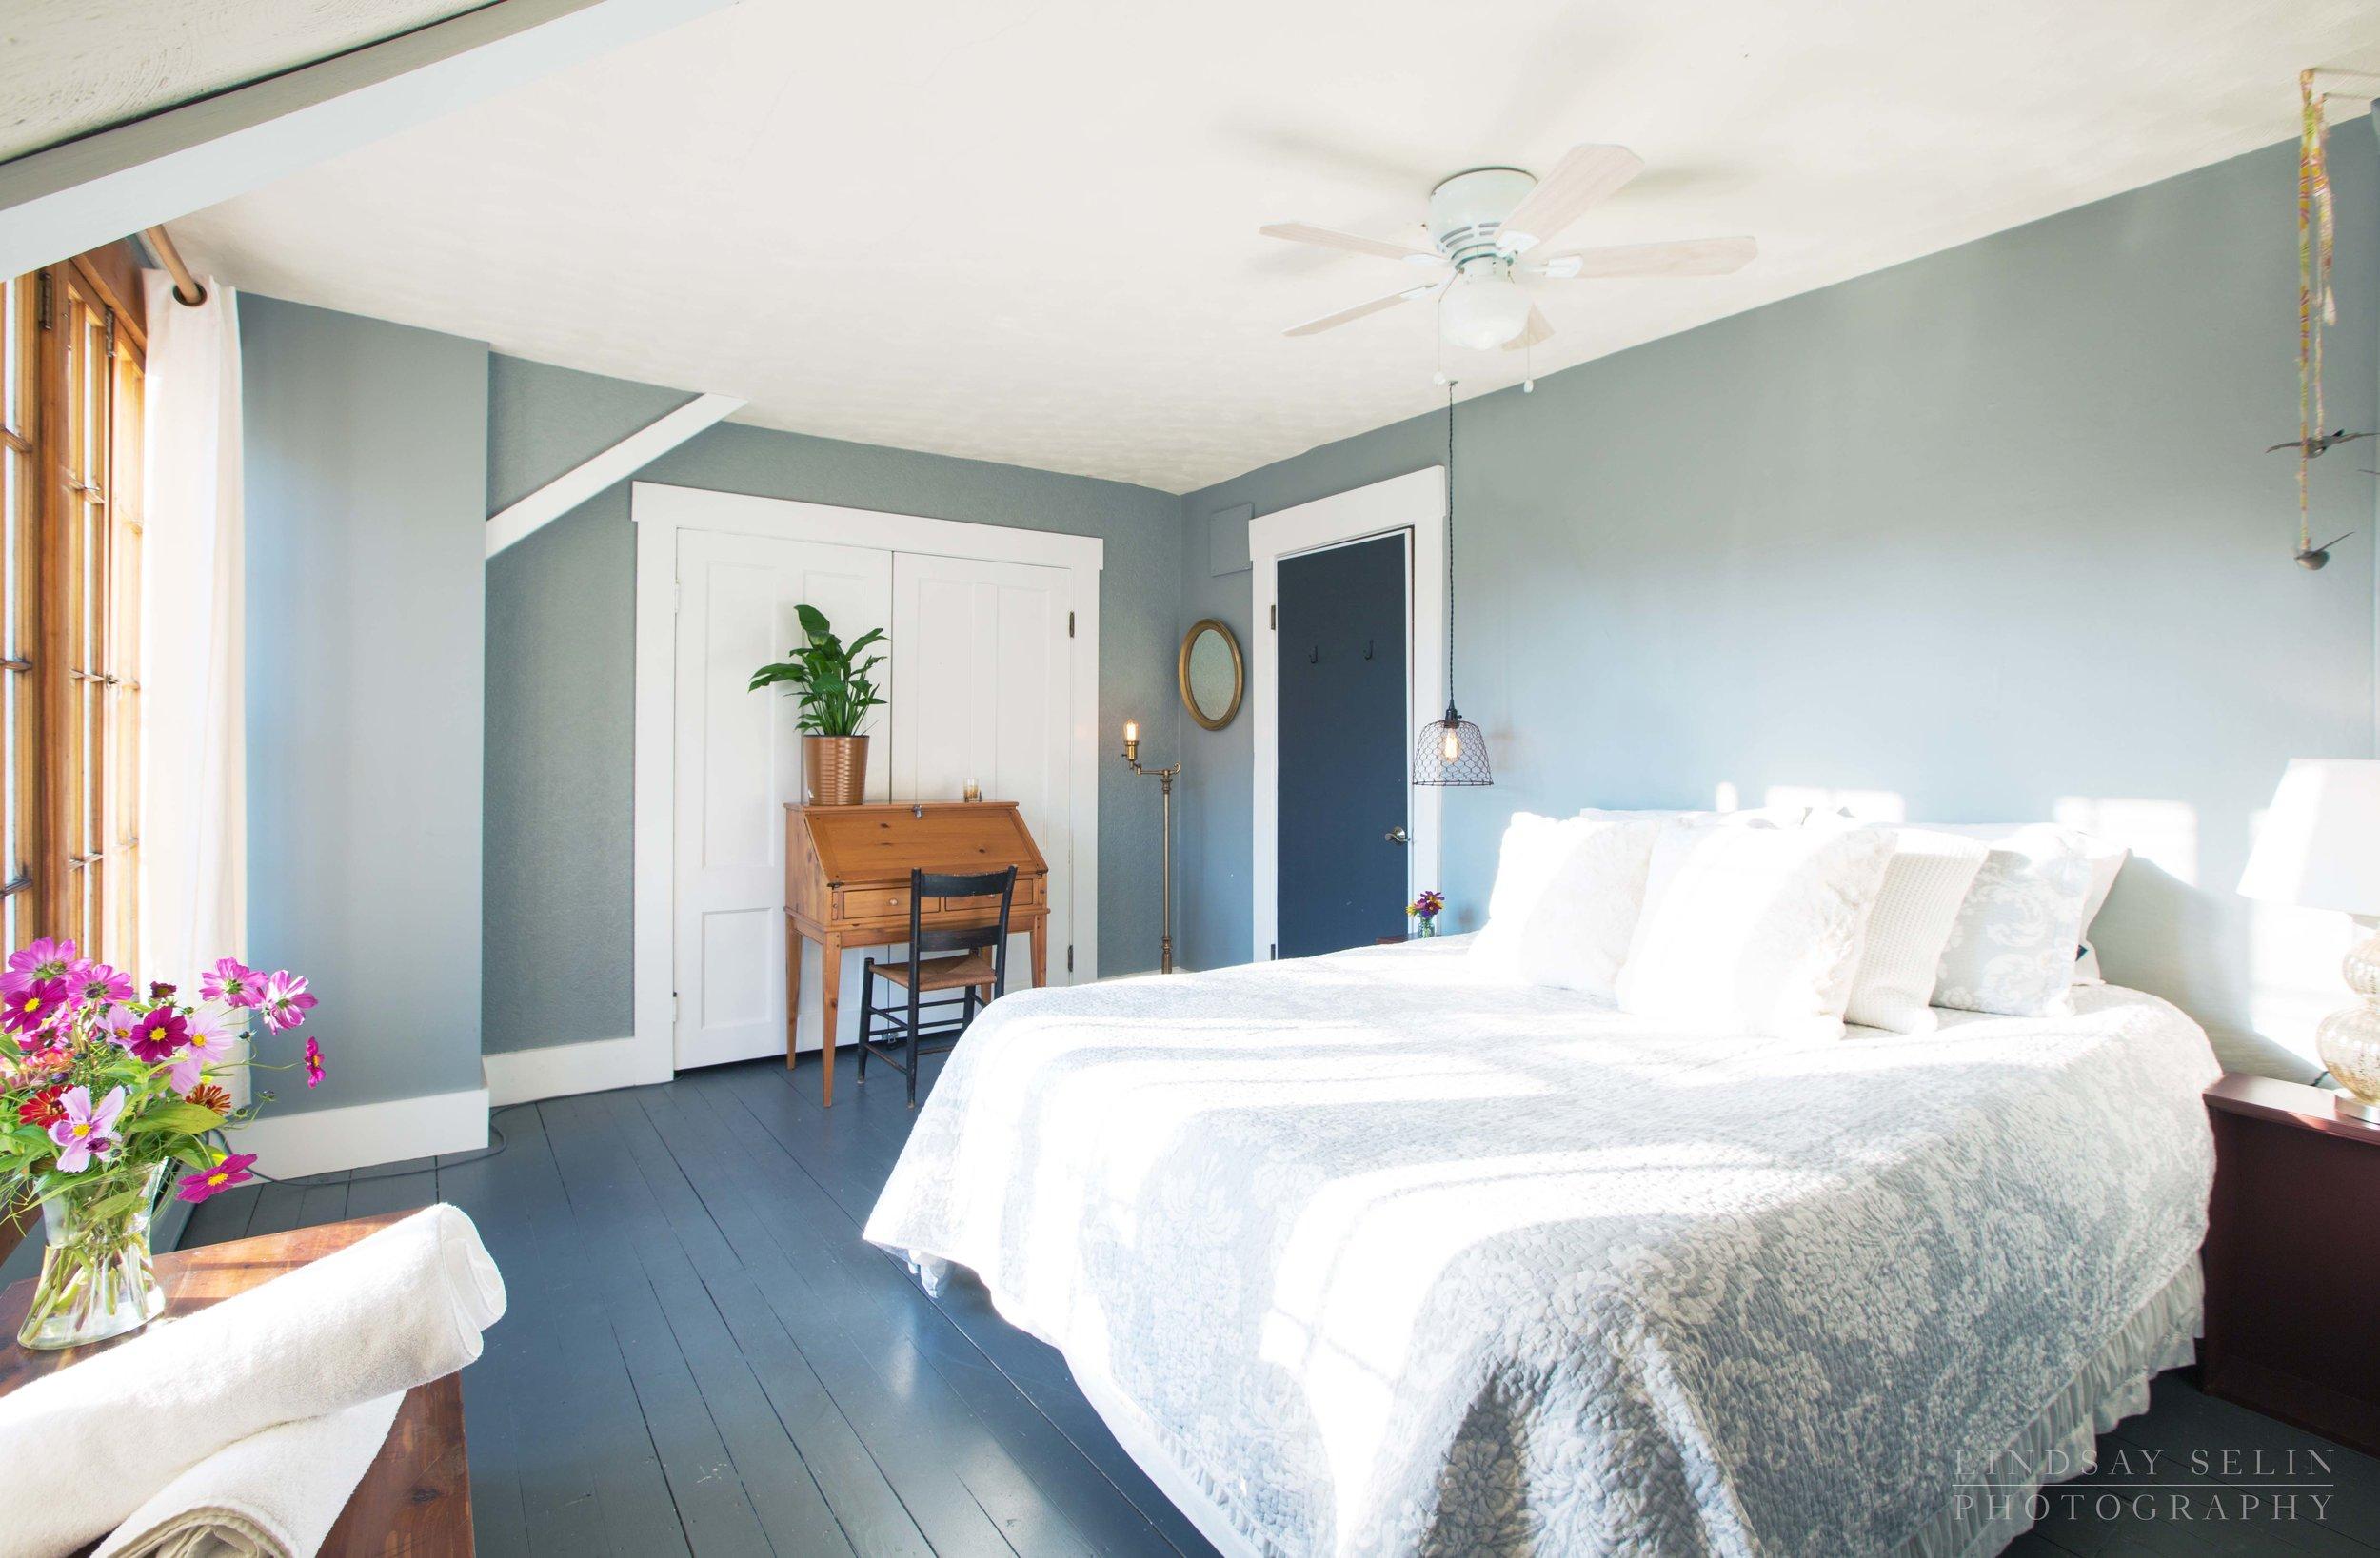 Homestyle Hostel_Apartment 2 watermarked.jpg